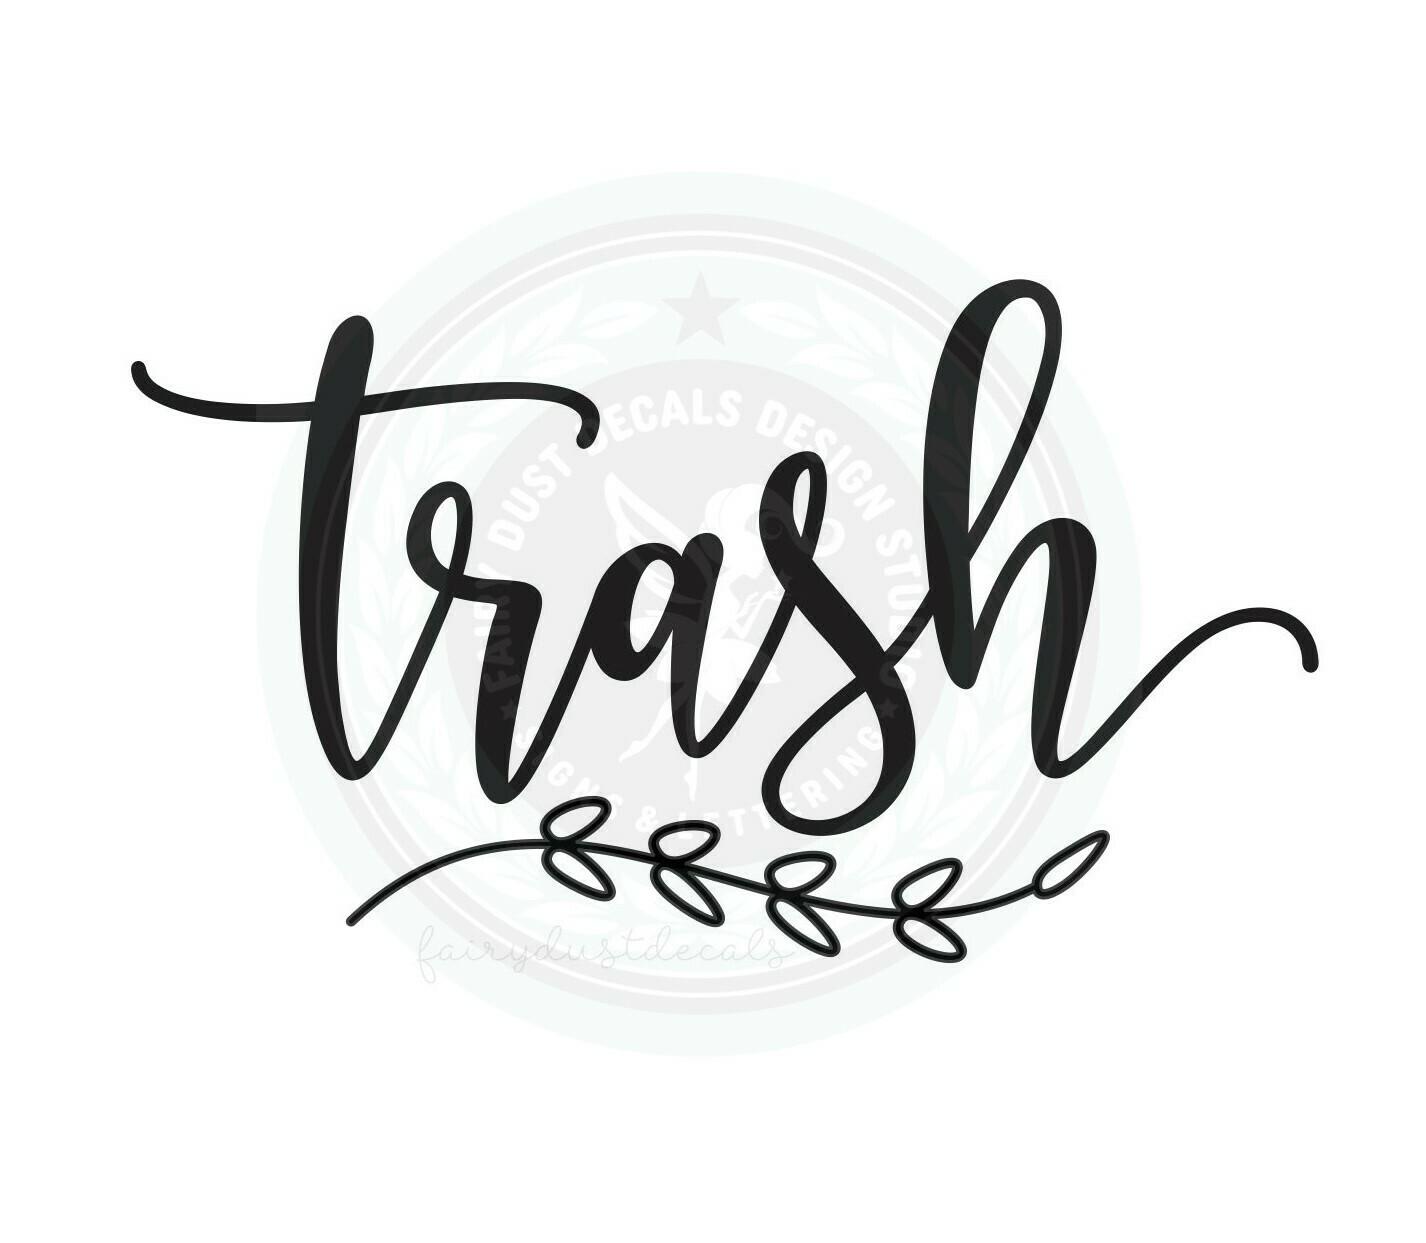 Trash Decal - script style with leaf